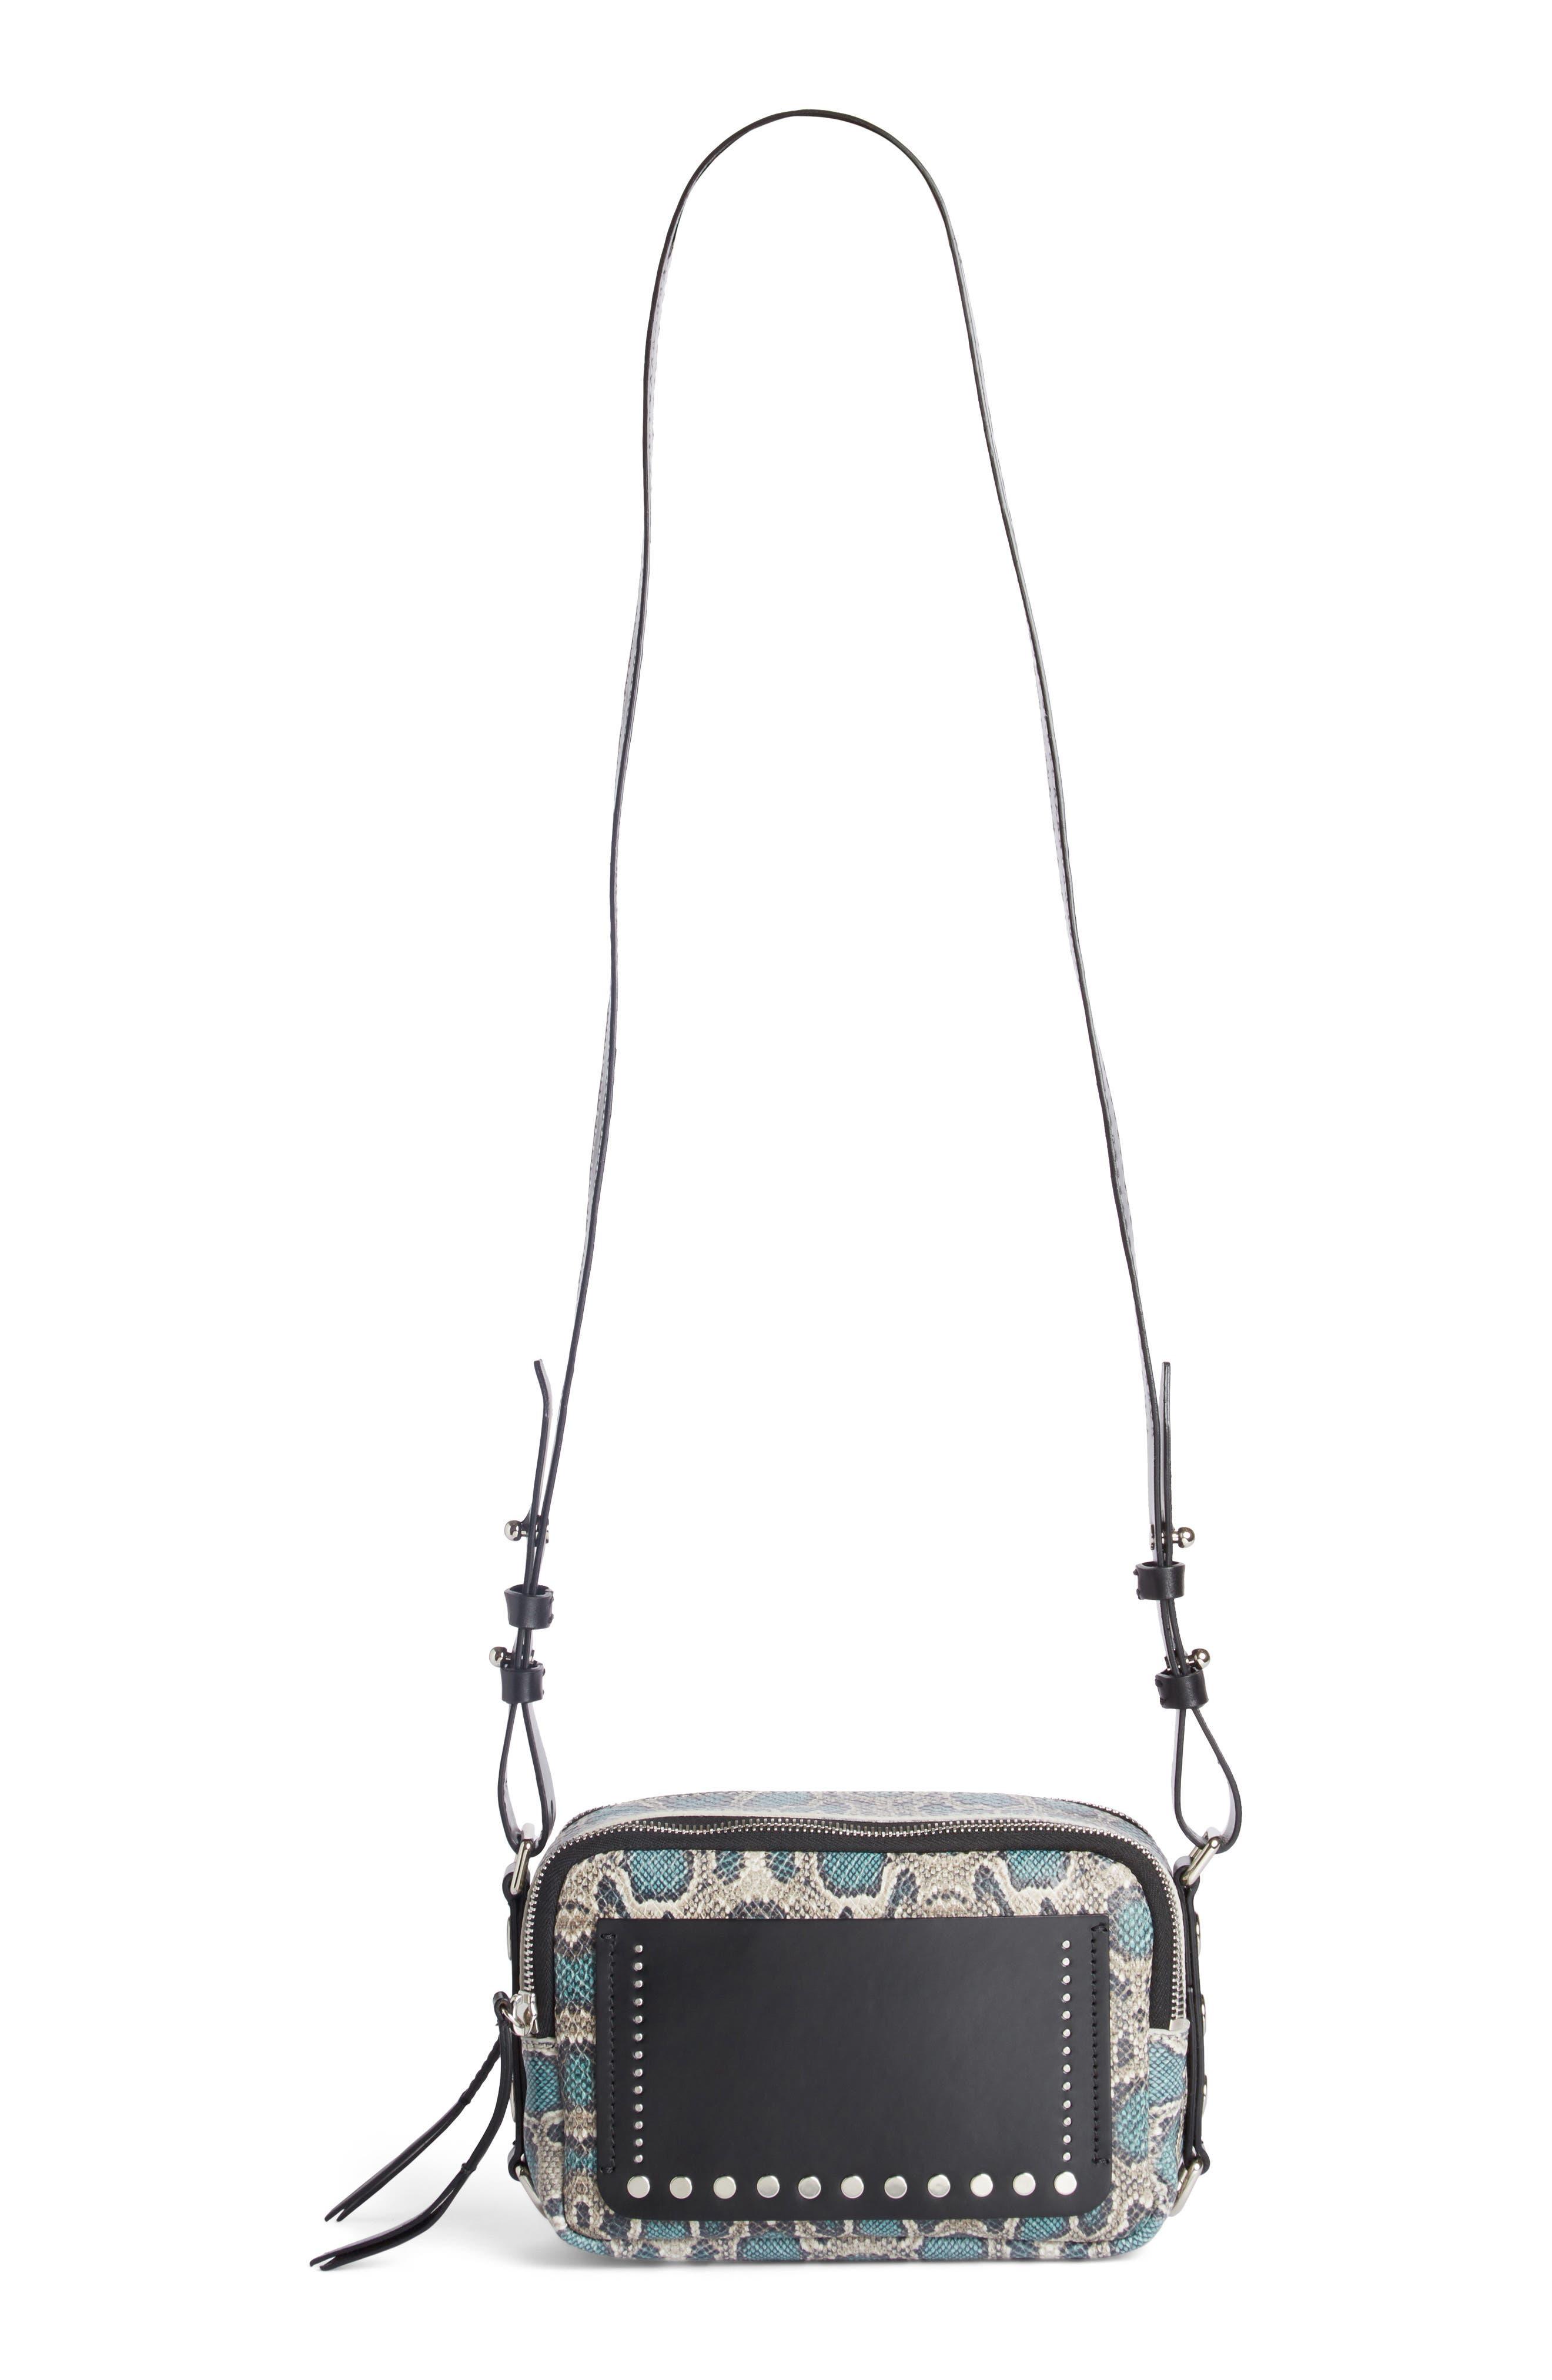 Tinley Studded Leather Crossbody Bag,                             Alternate thumbnail 2, color,                             Verdigris